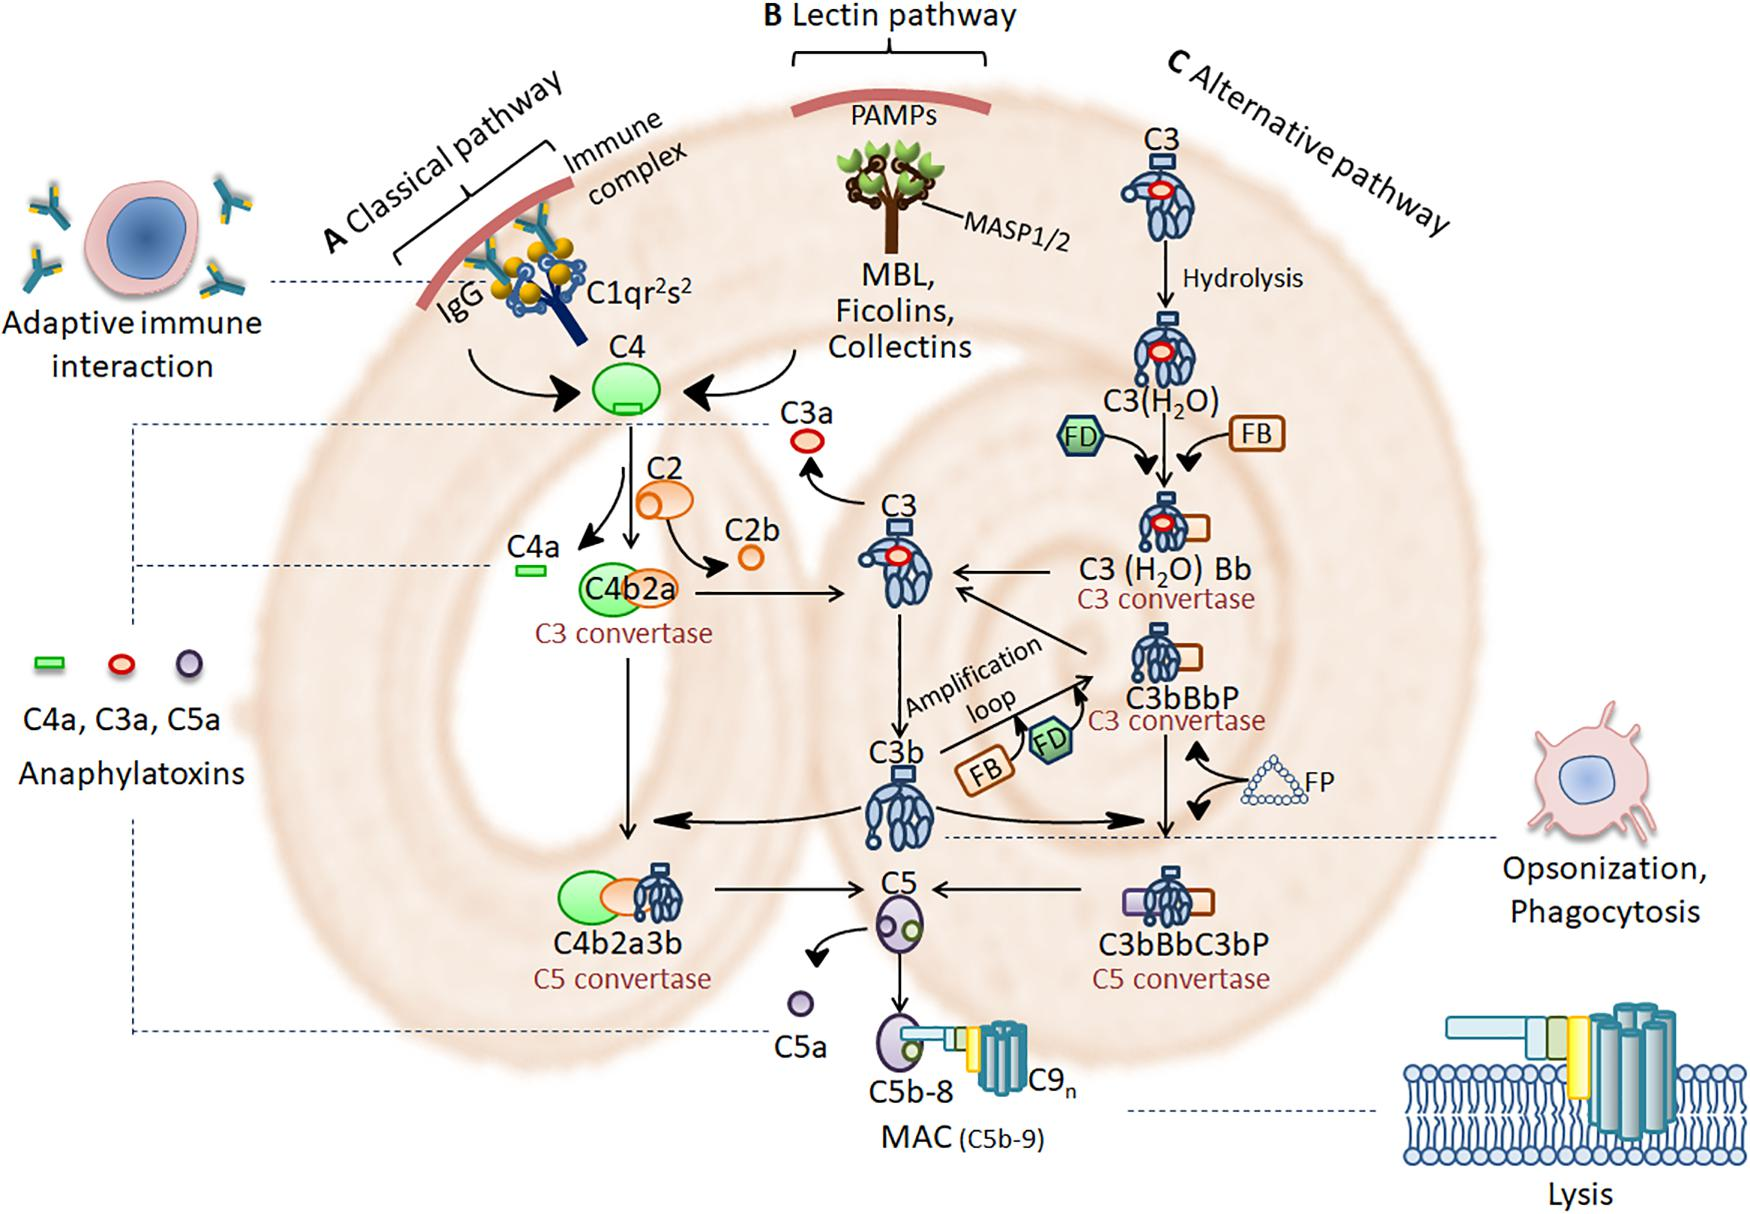 helminth immune evasion strategies nombre cientifico de oxiuros